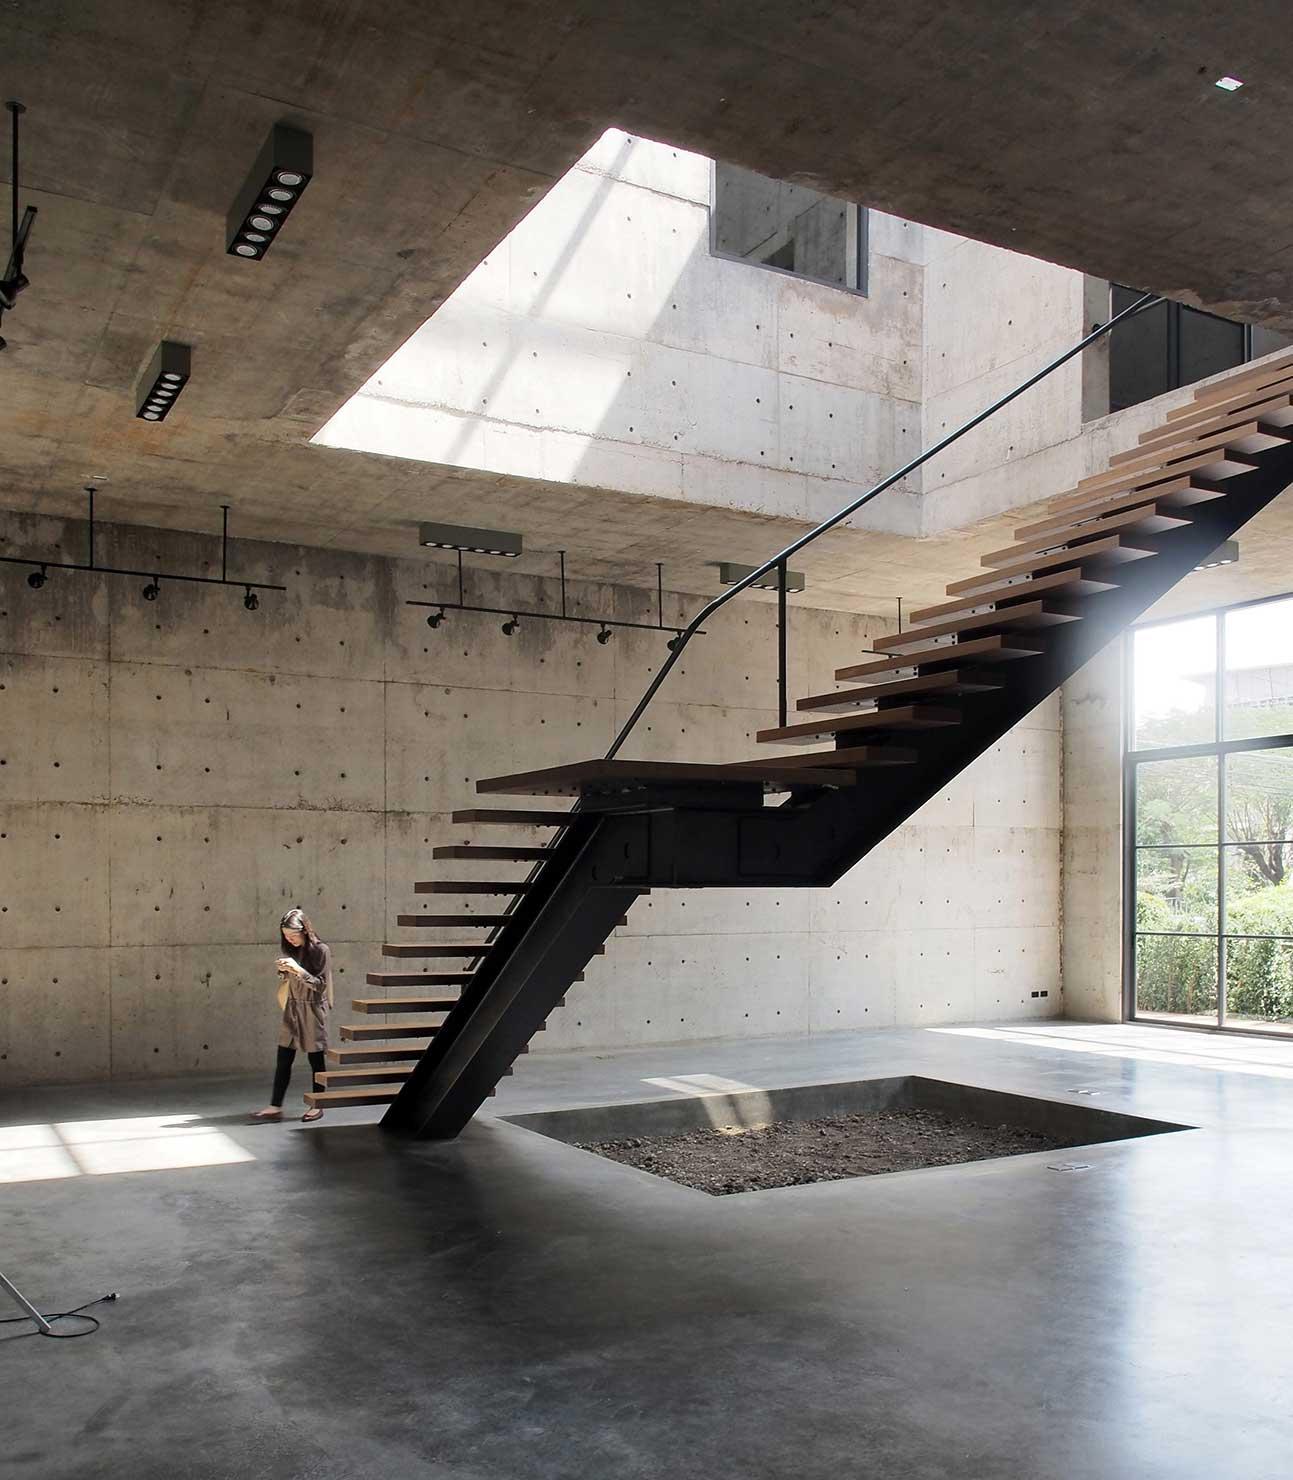 construcao-flavio-machado-arquitetura-escada-2